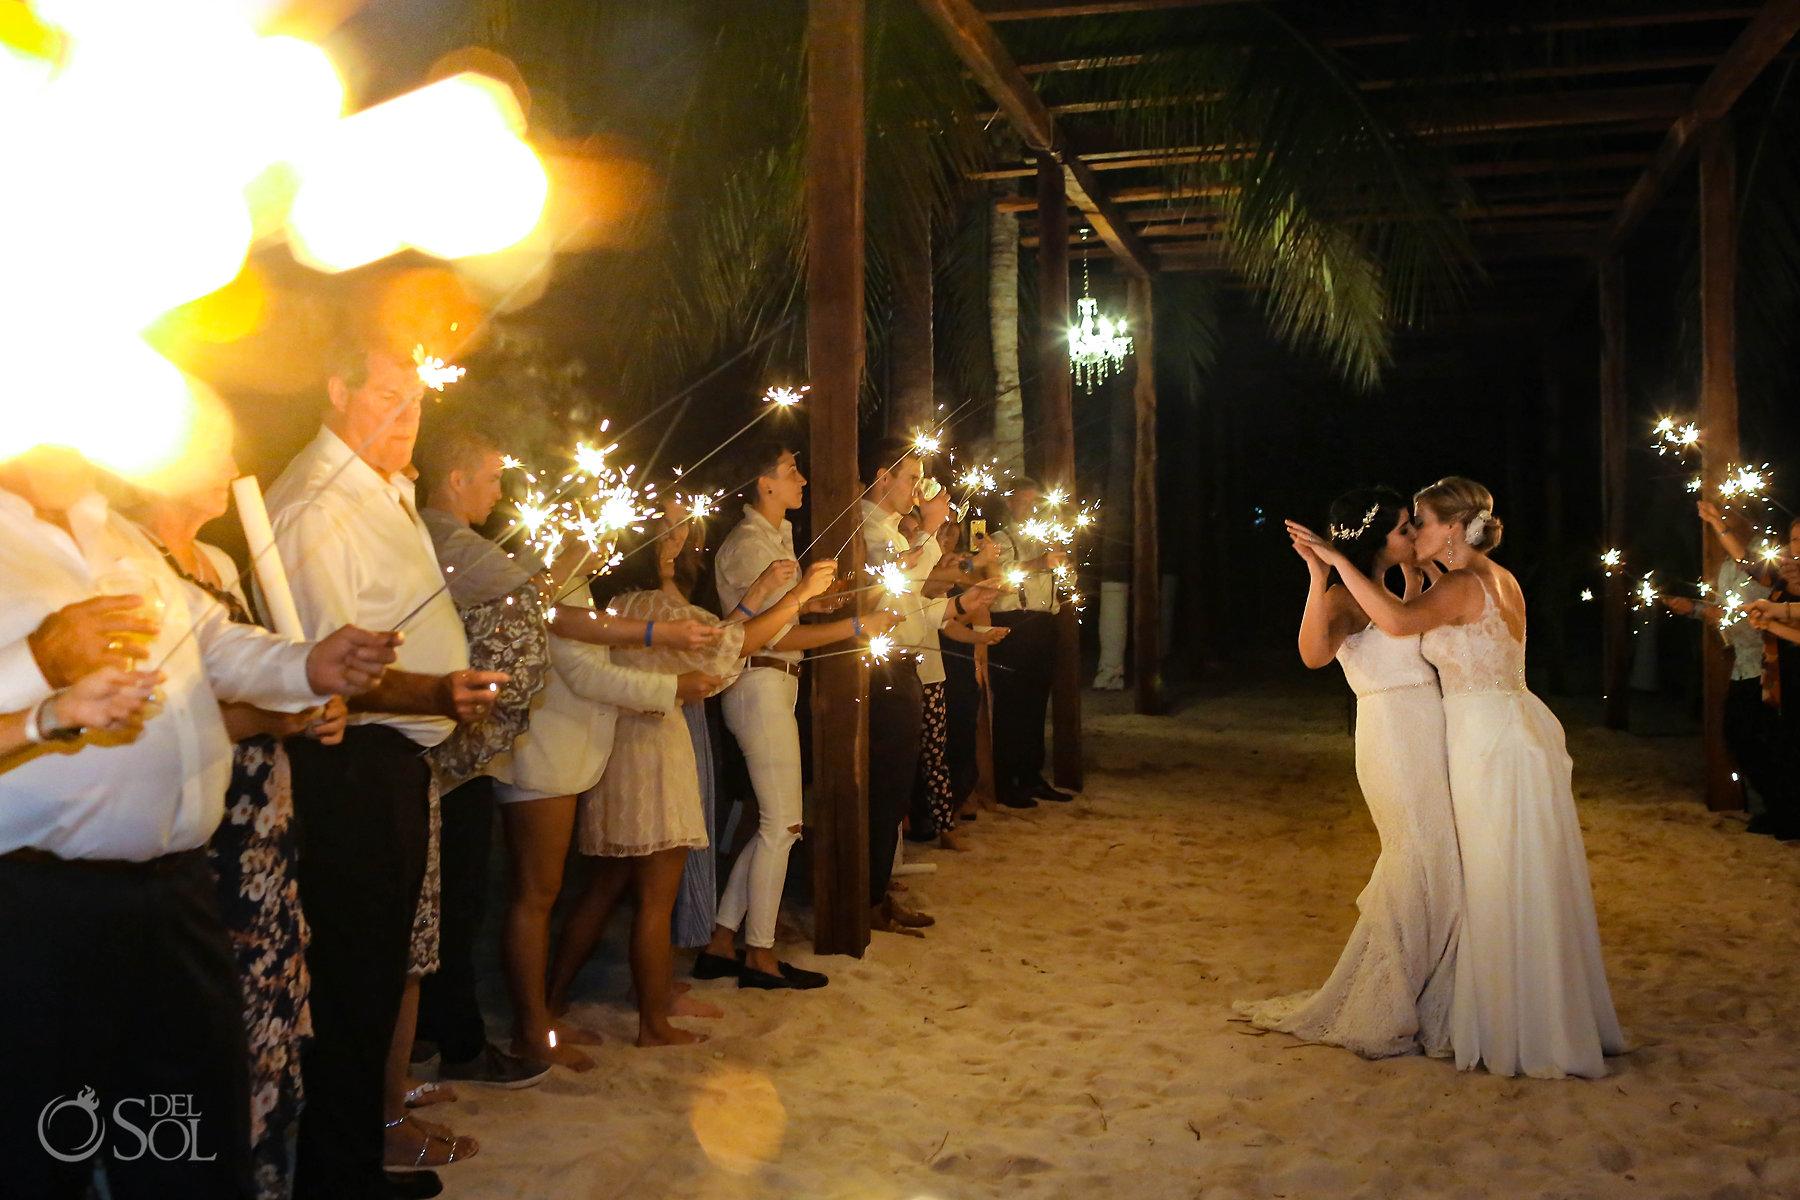 LGBT Wedding Sparklers lesbian brides kissing